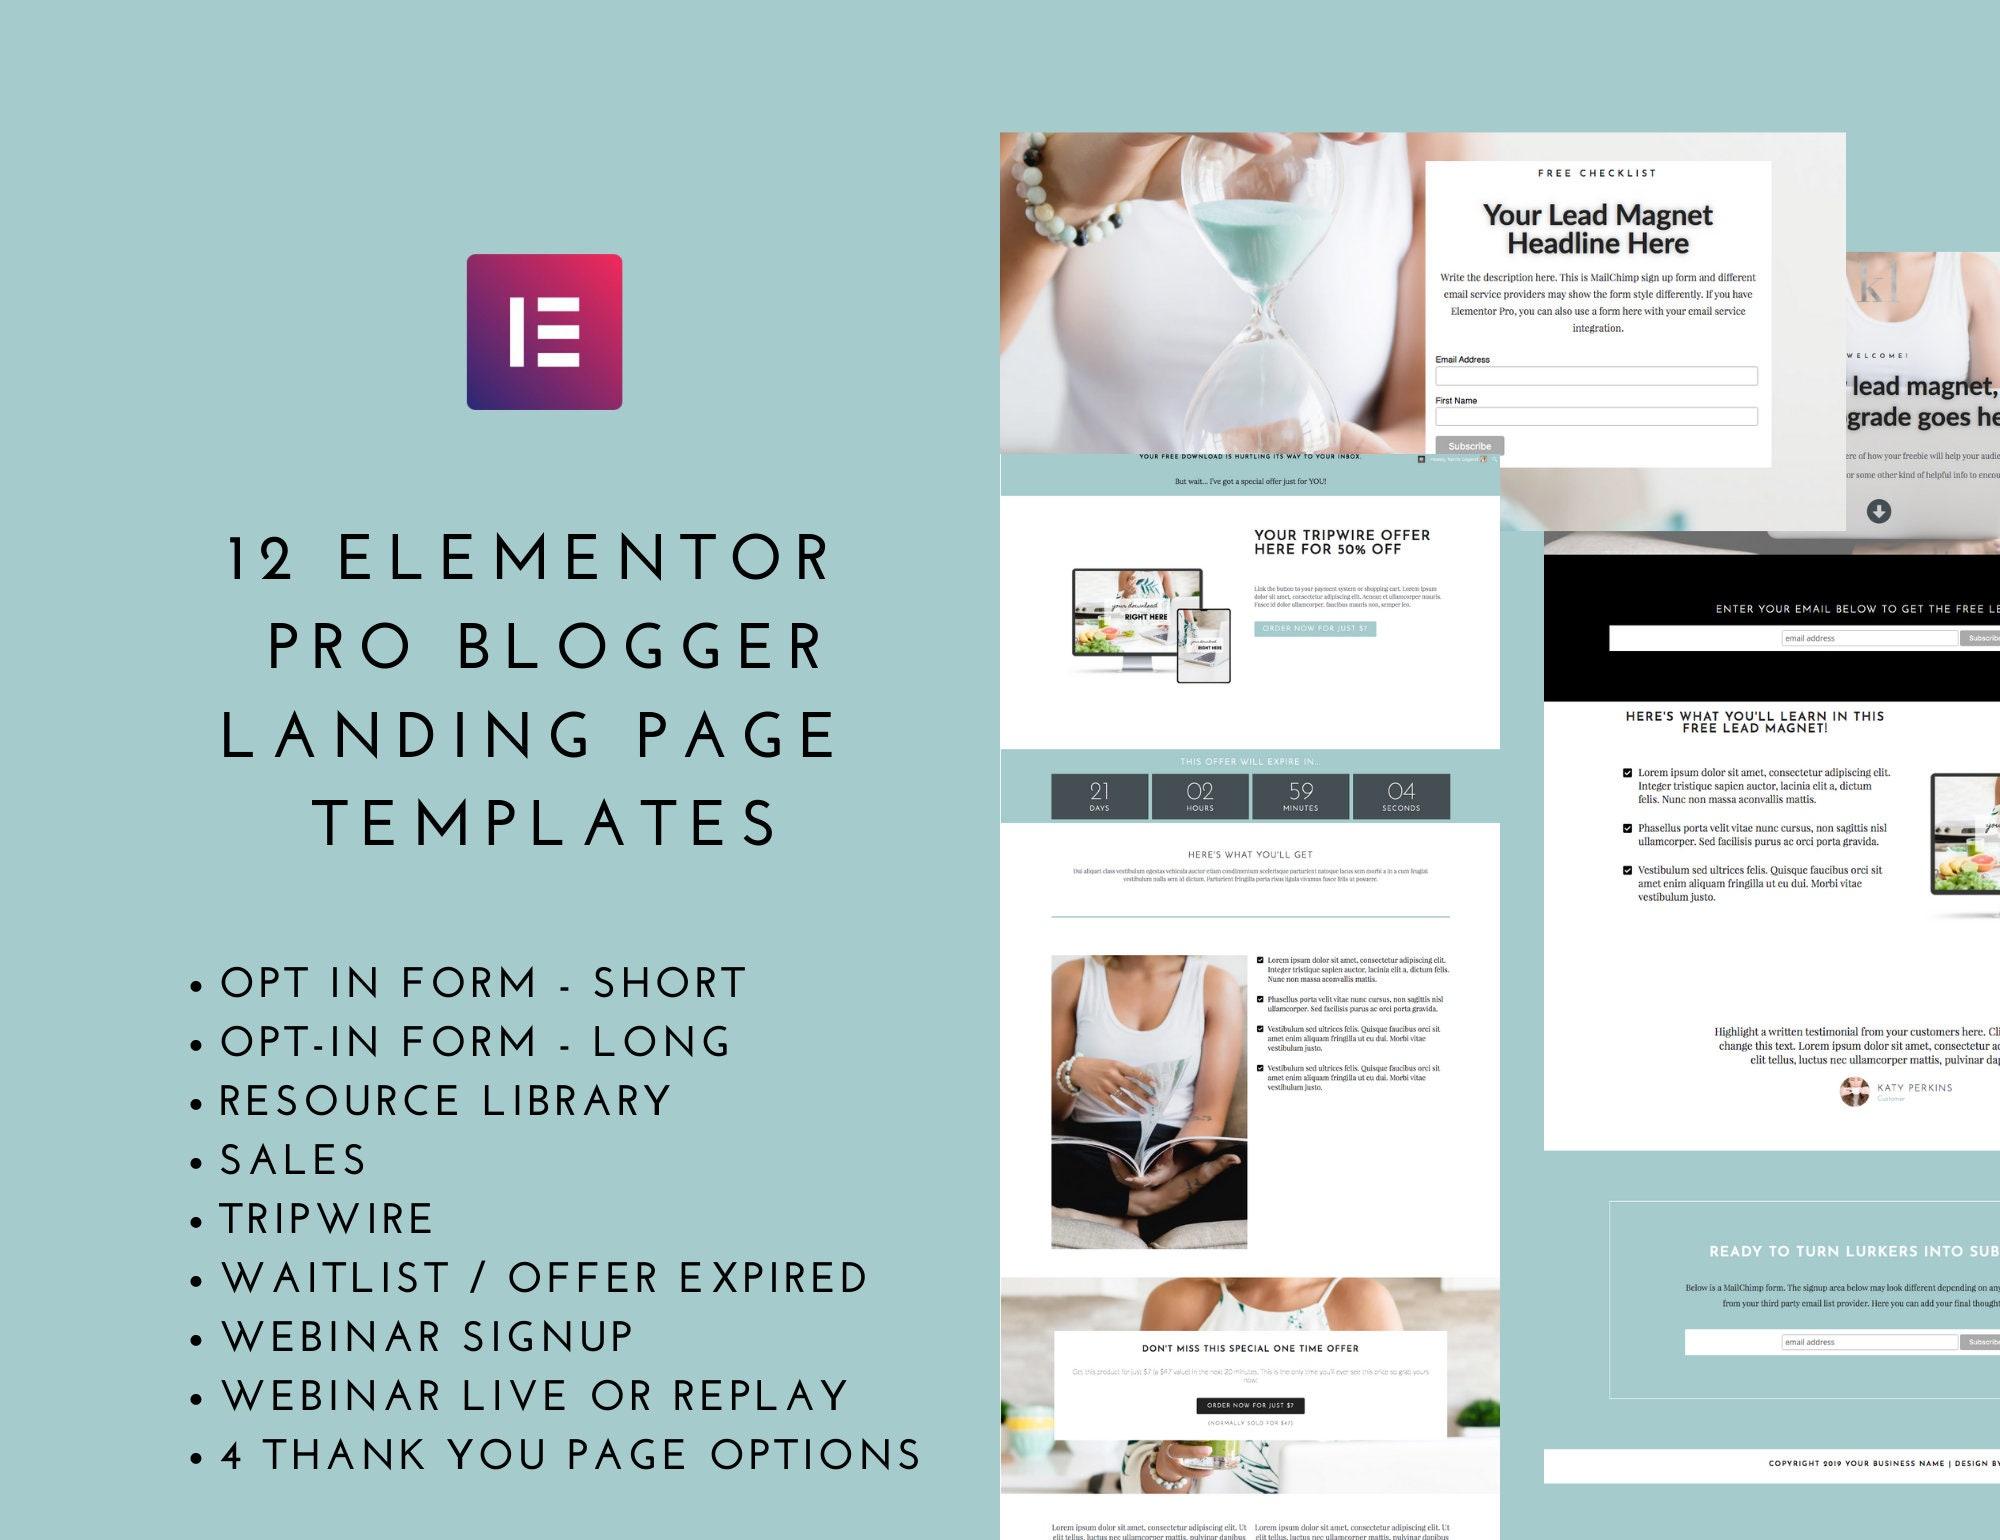 Landing Page Template Elementor Bundle - Pro Blogger Set